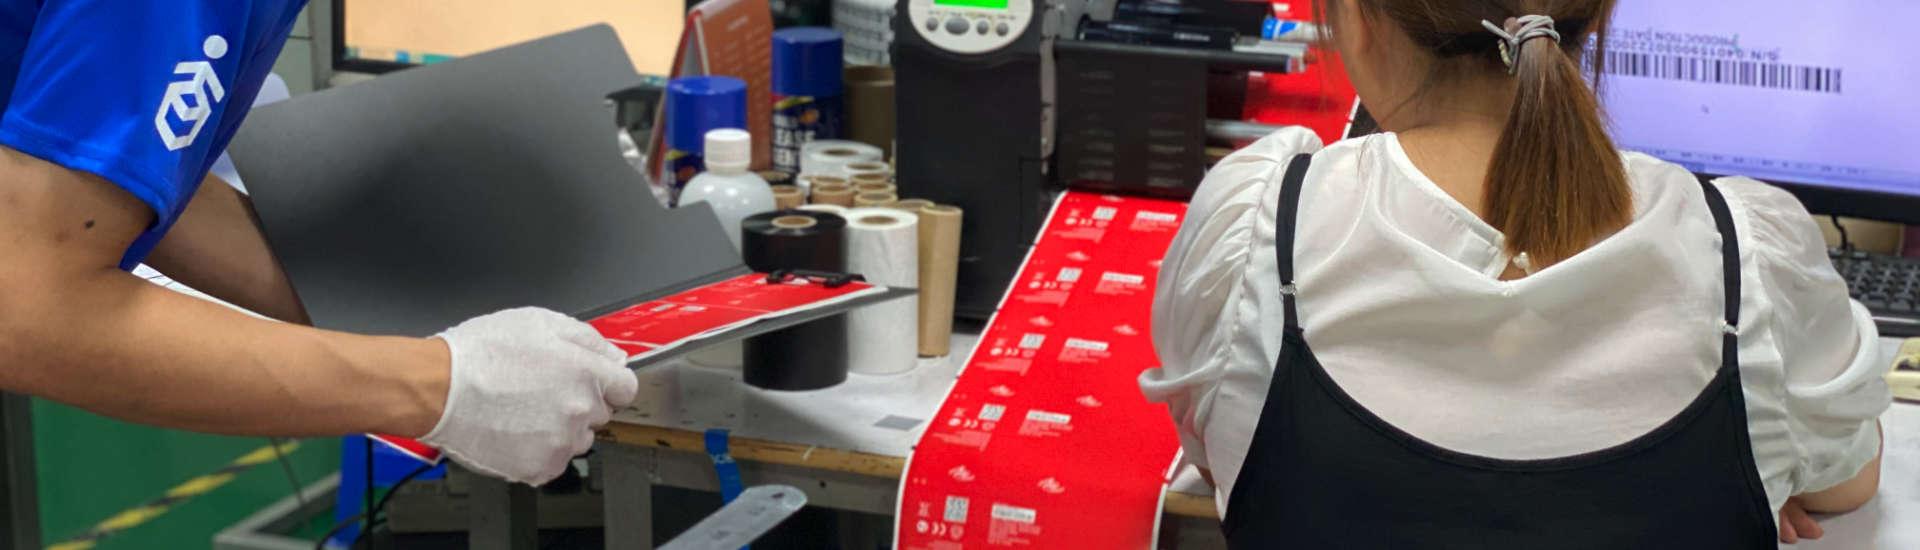 Image-of-China-Amazon-FBA-inspection